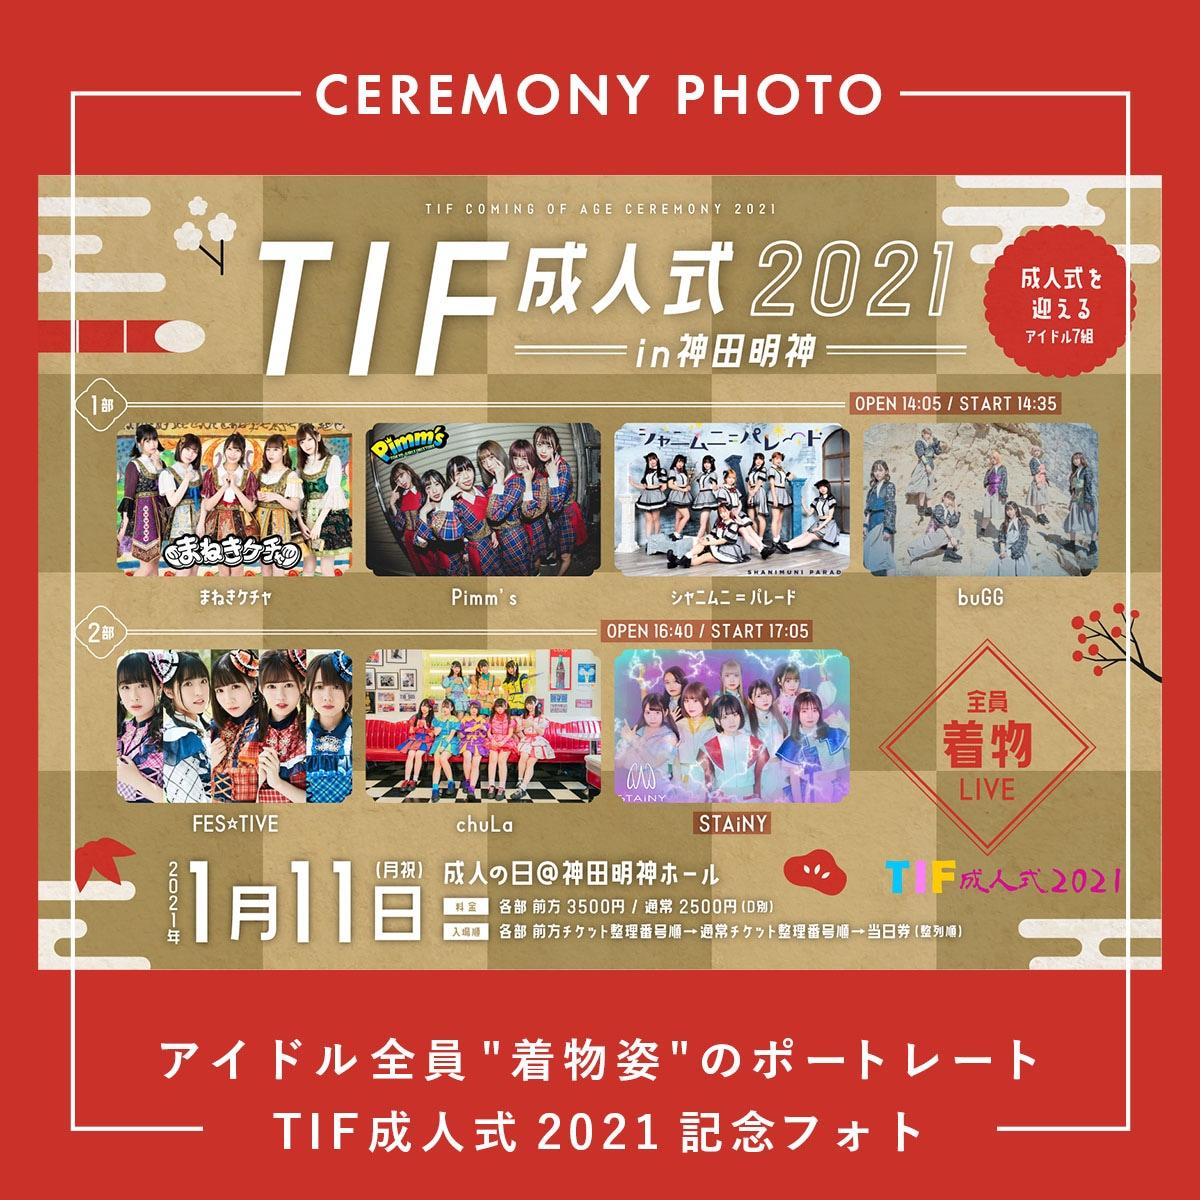 【TIF成人式 2021 in 神田明神】記念写真販売